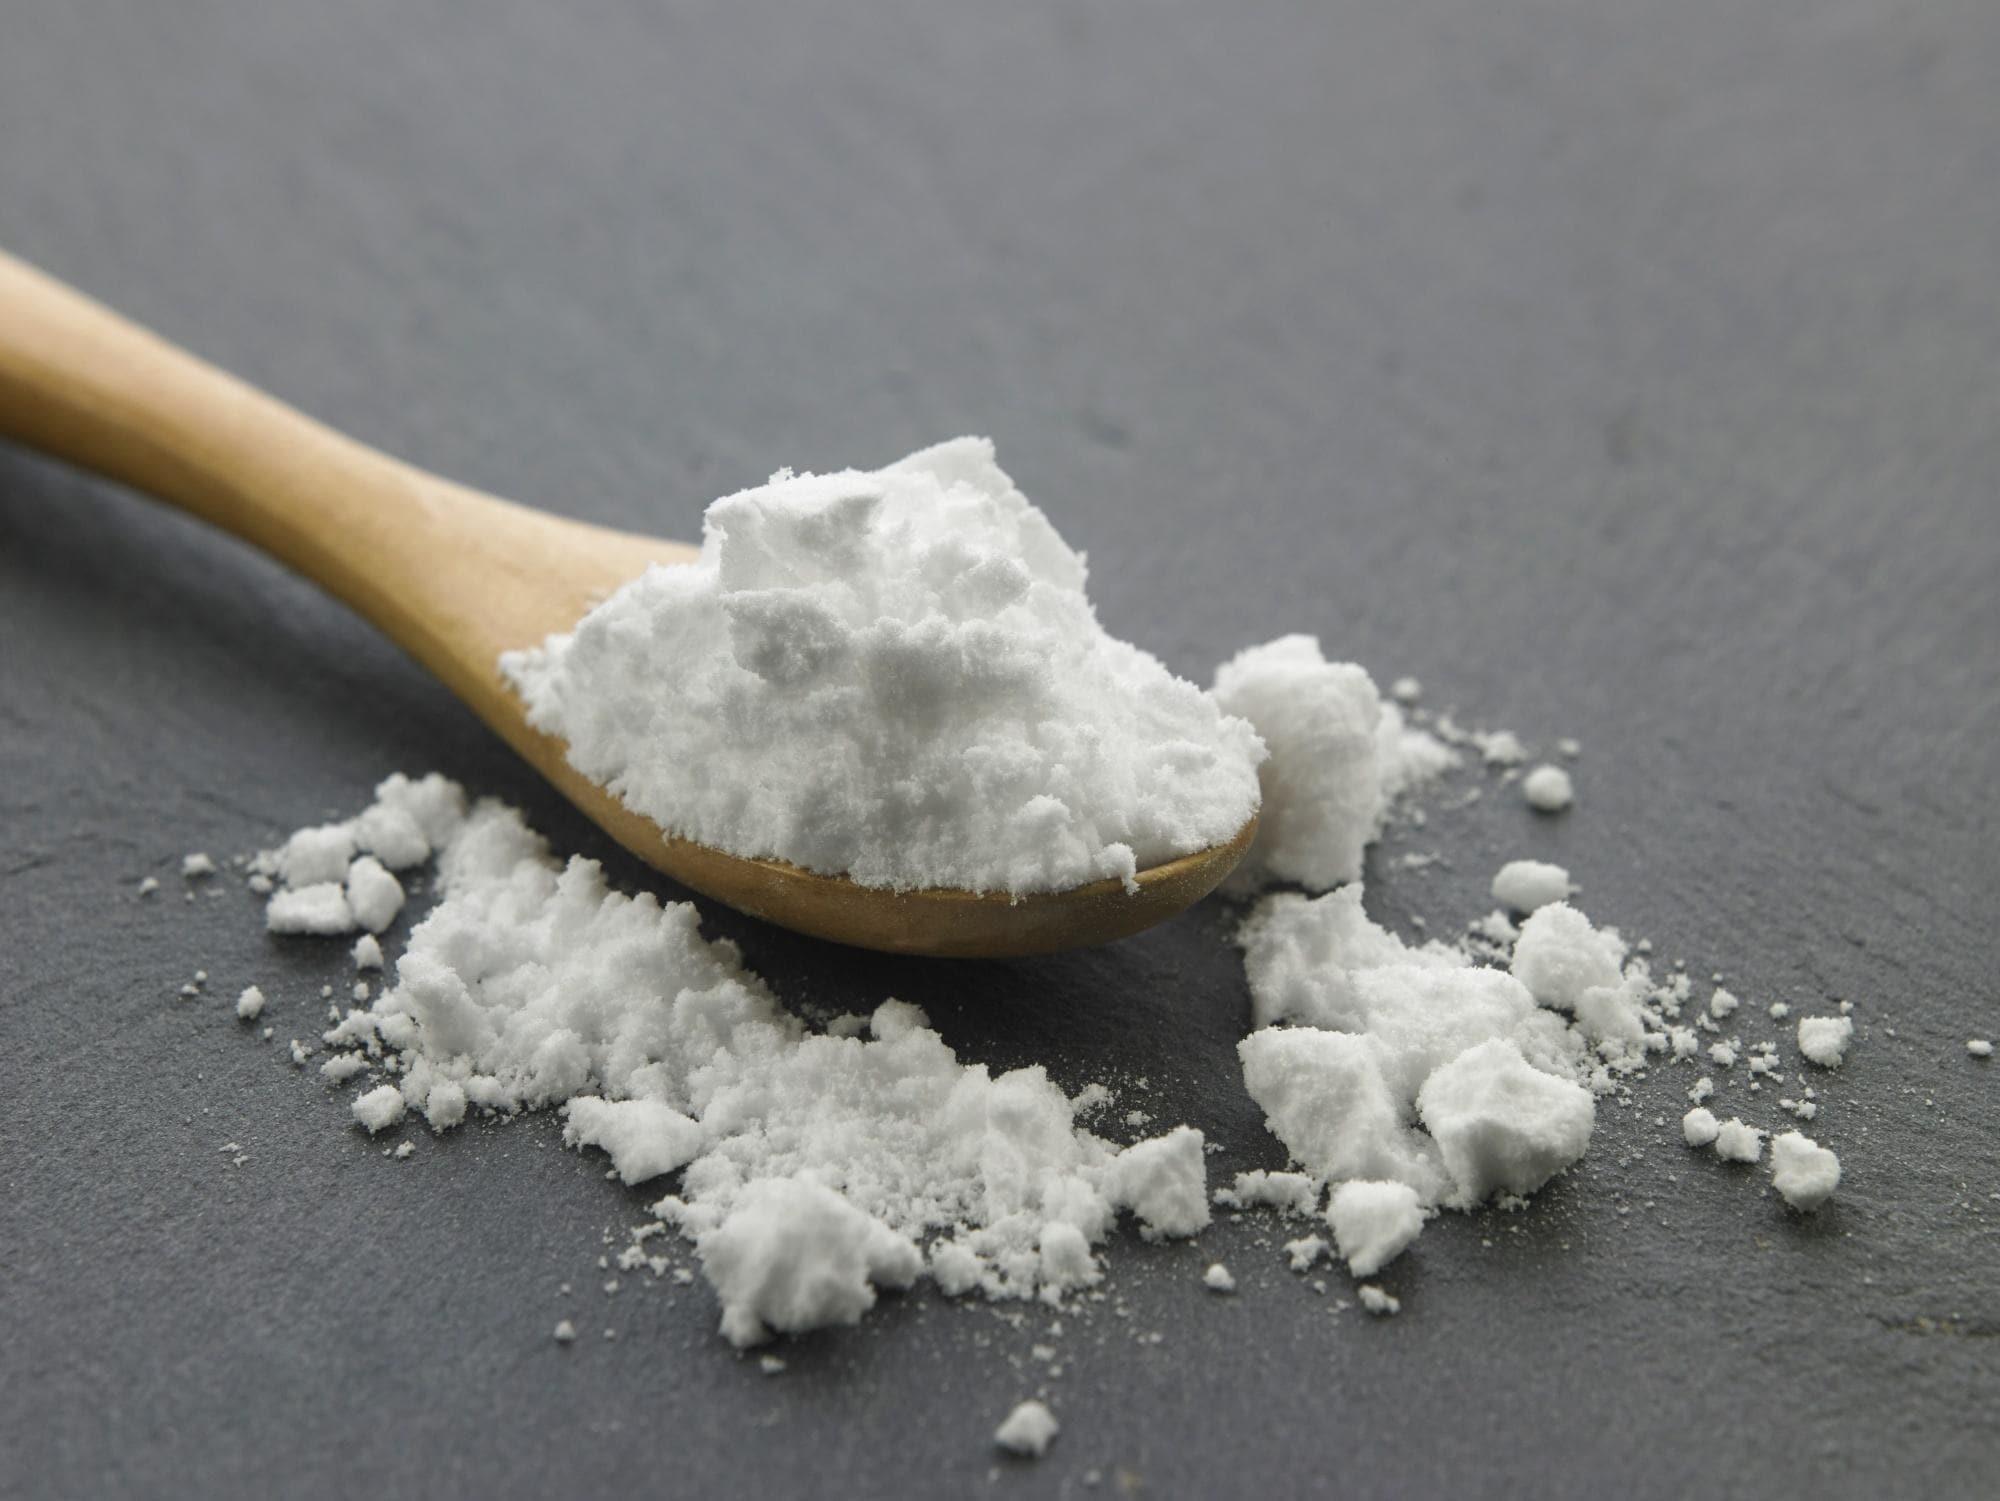 Natural dandruff remedies: a spoonful of baking soda